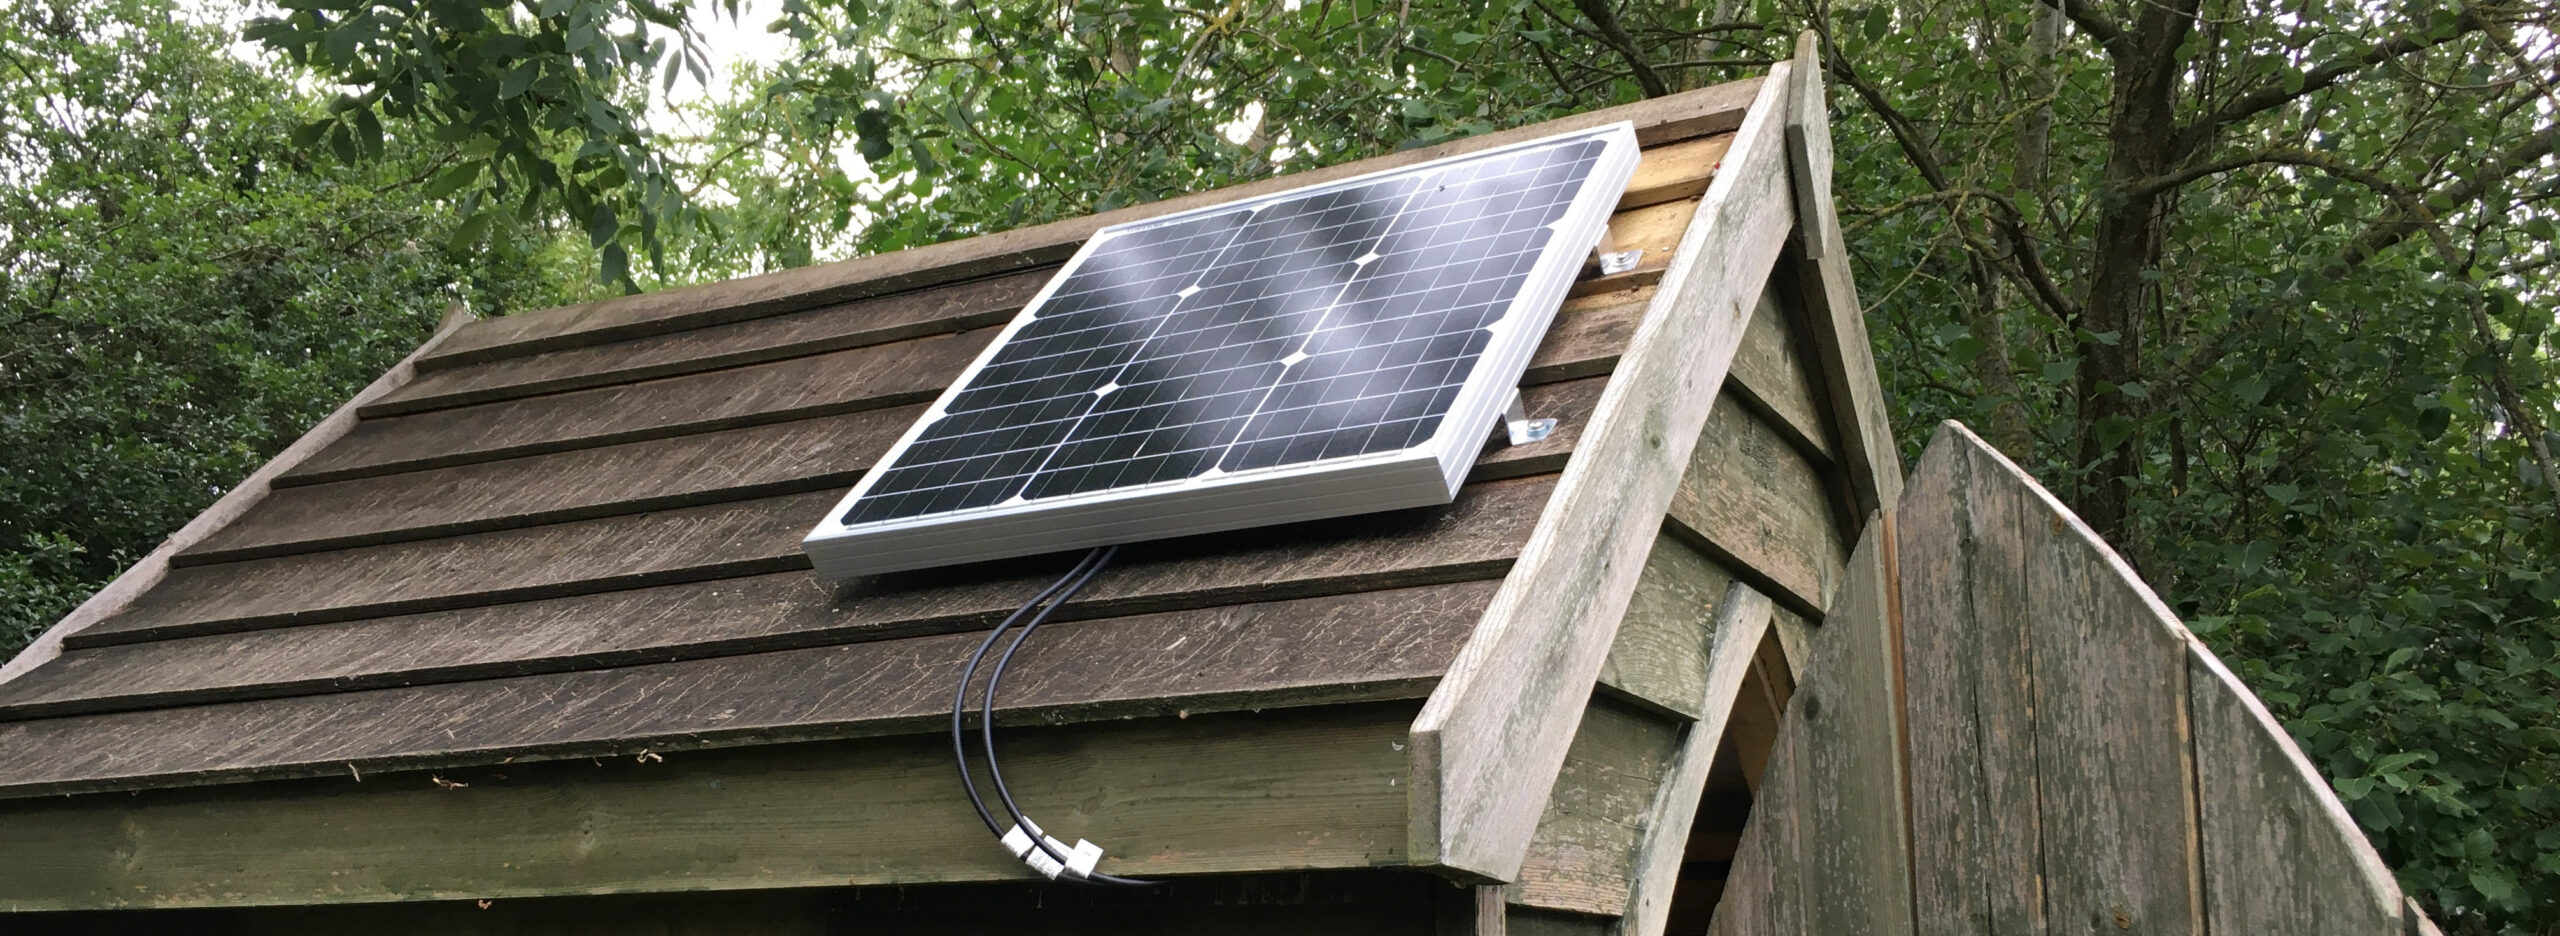 50 watt solar panel on shed roof